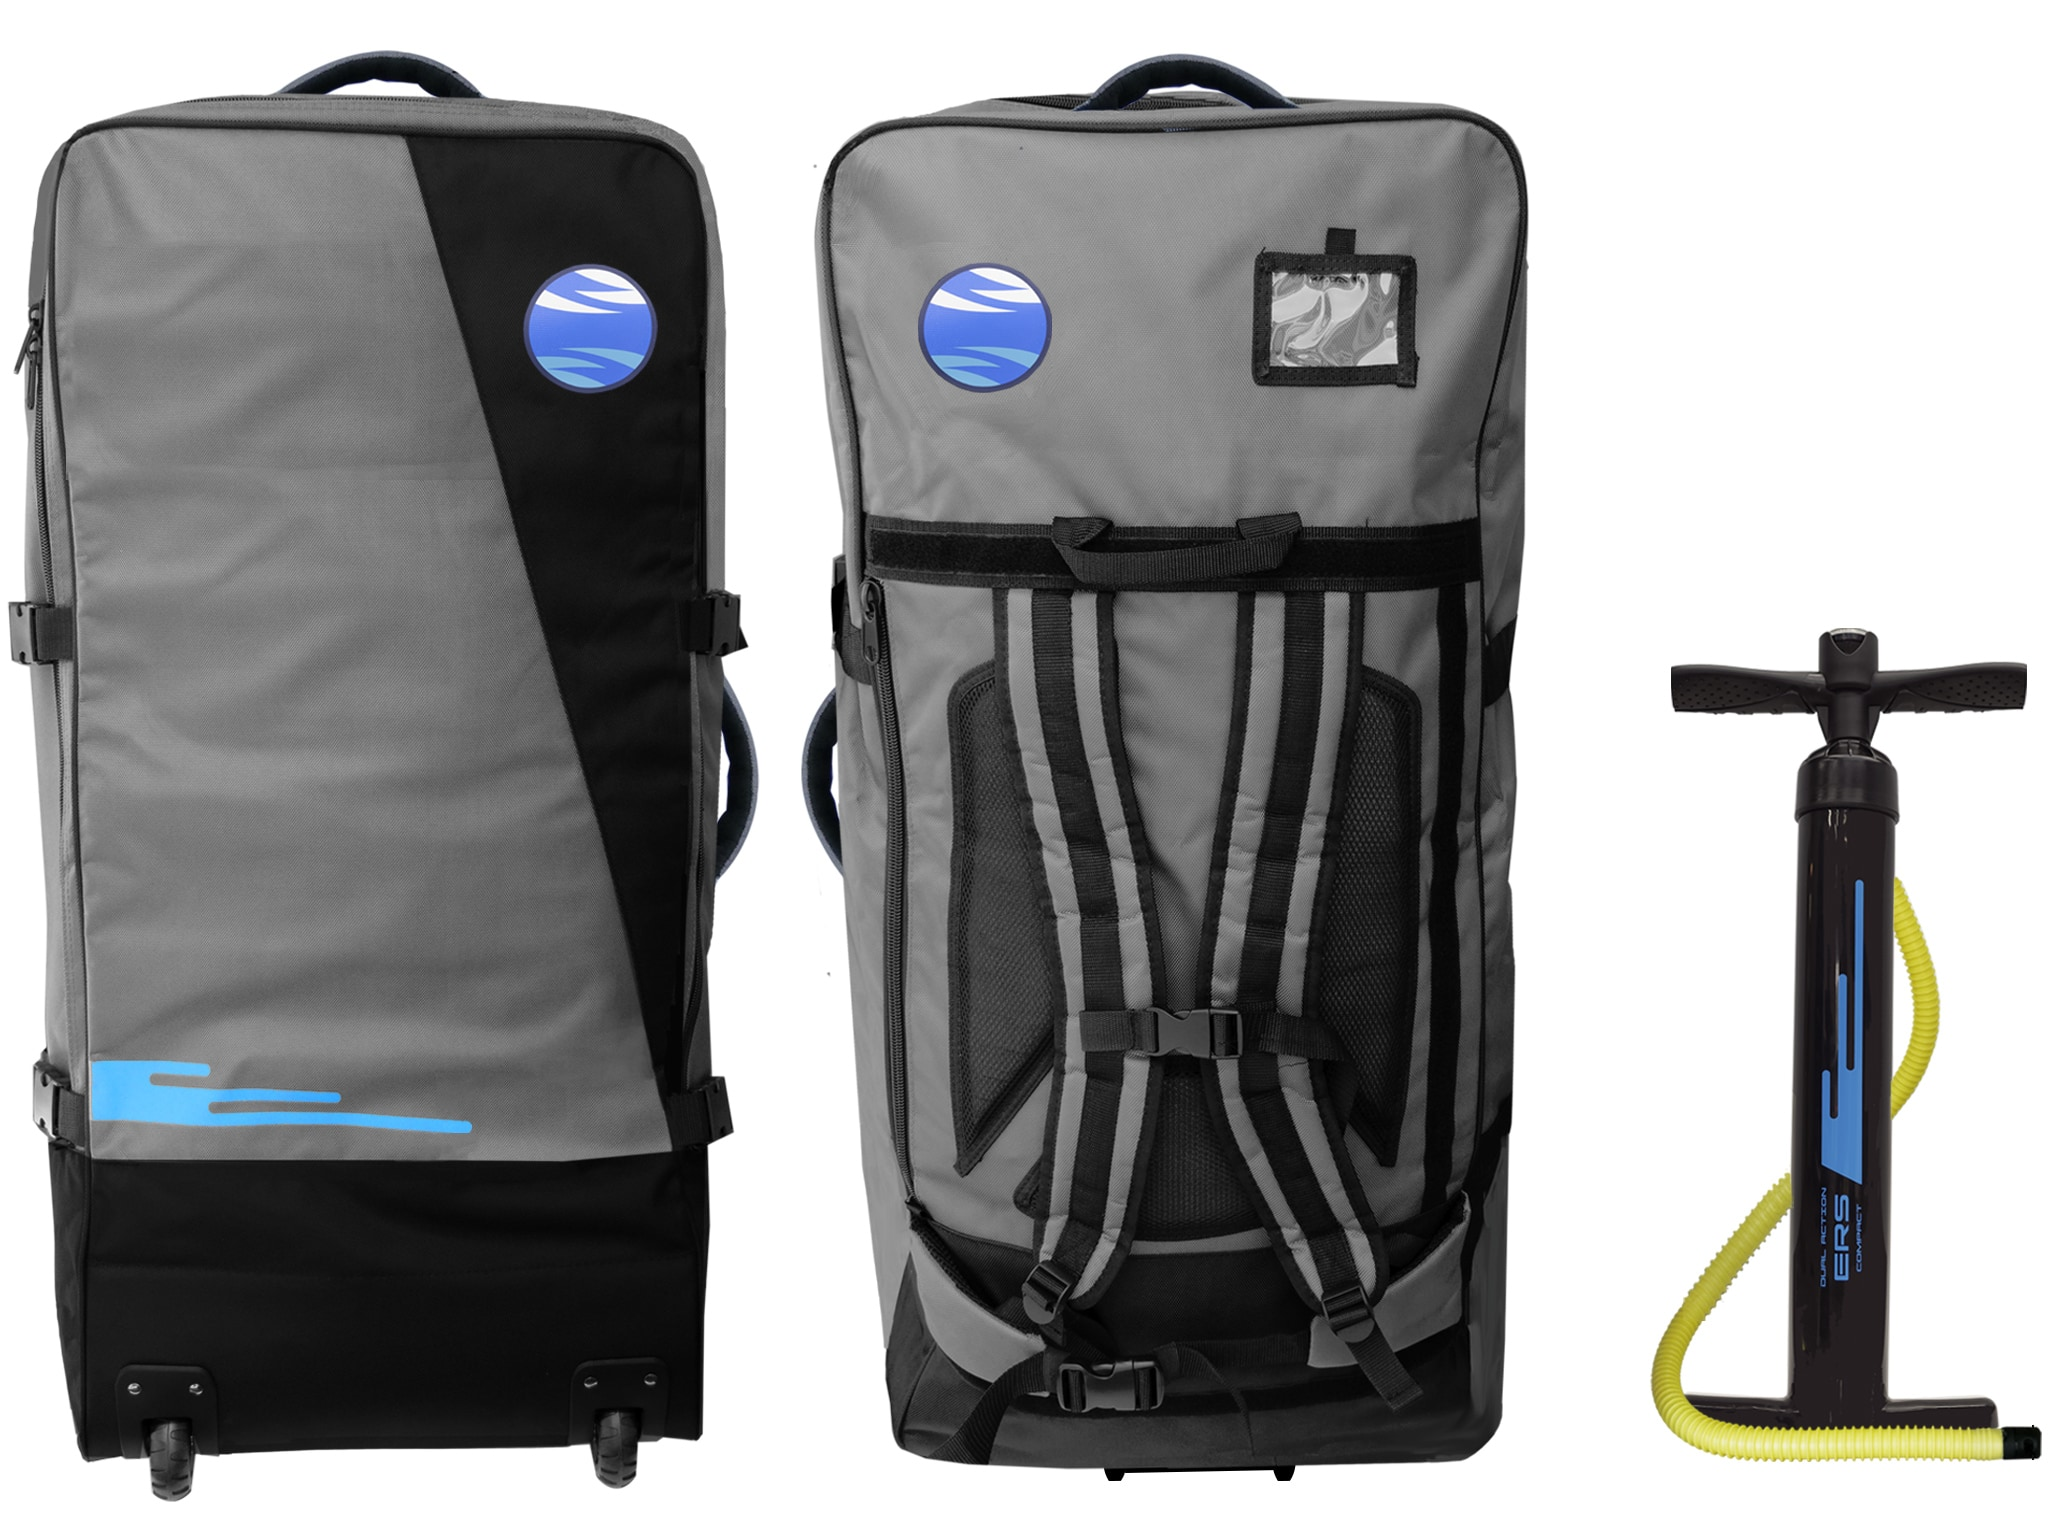 ERS Pump and Bag